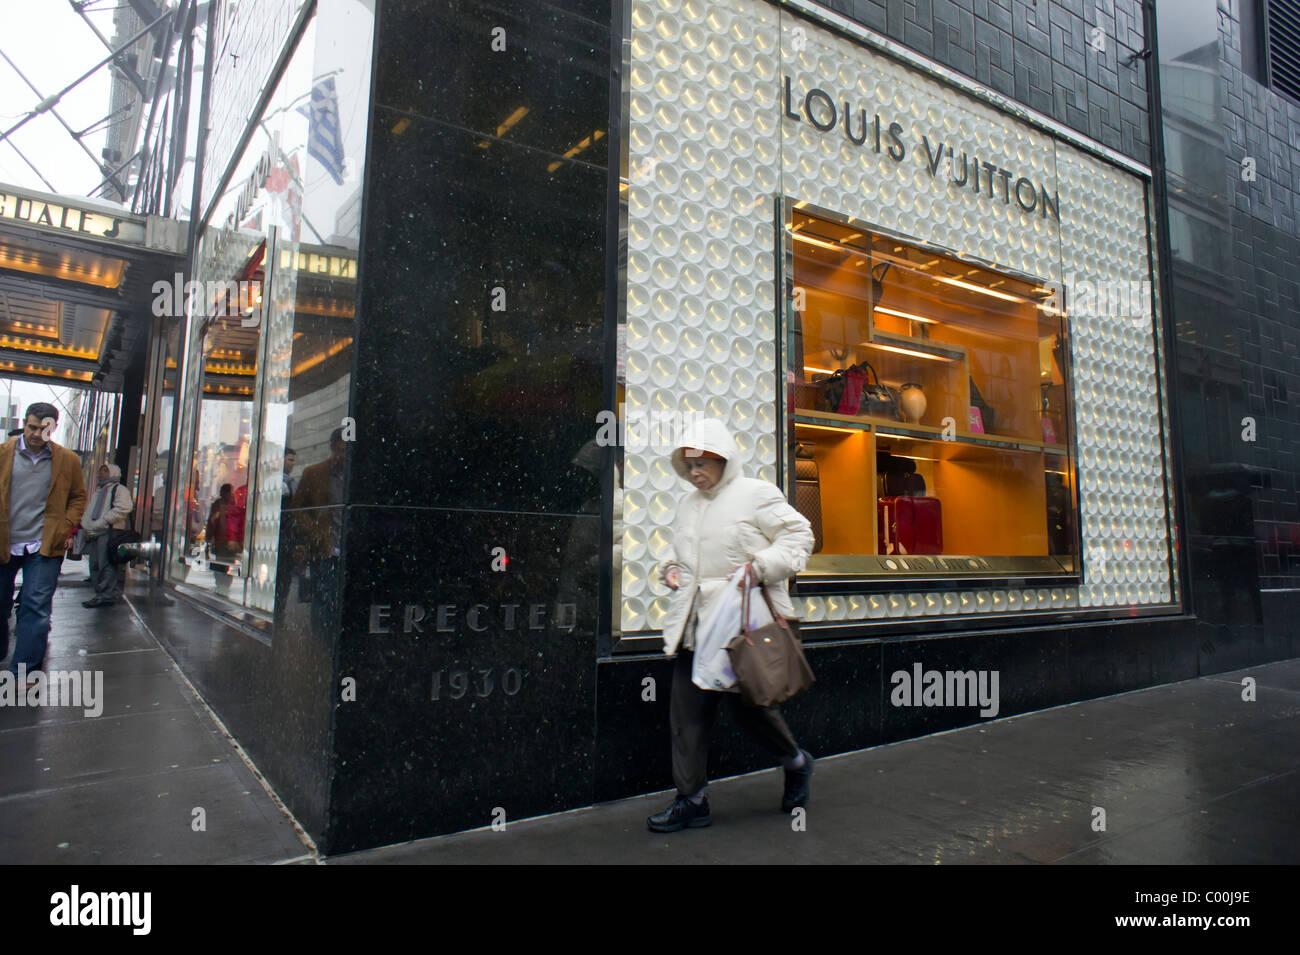 6ab540f3b708 Bloomingdale s department store promotes Louis Vuitton merchandise - Stock  Image